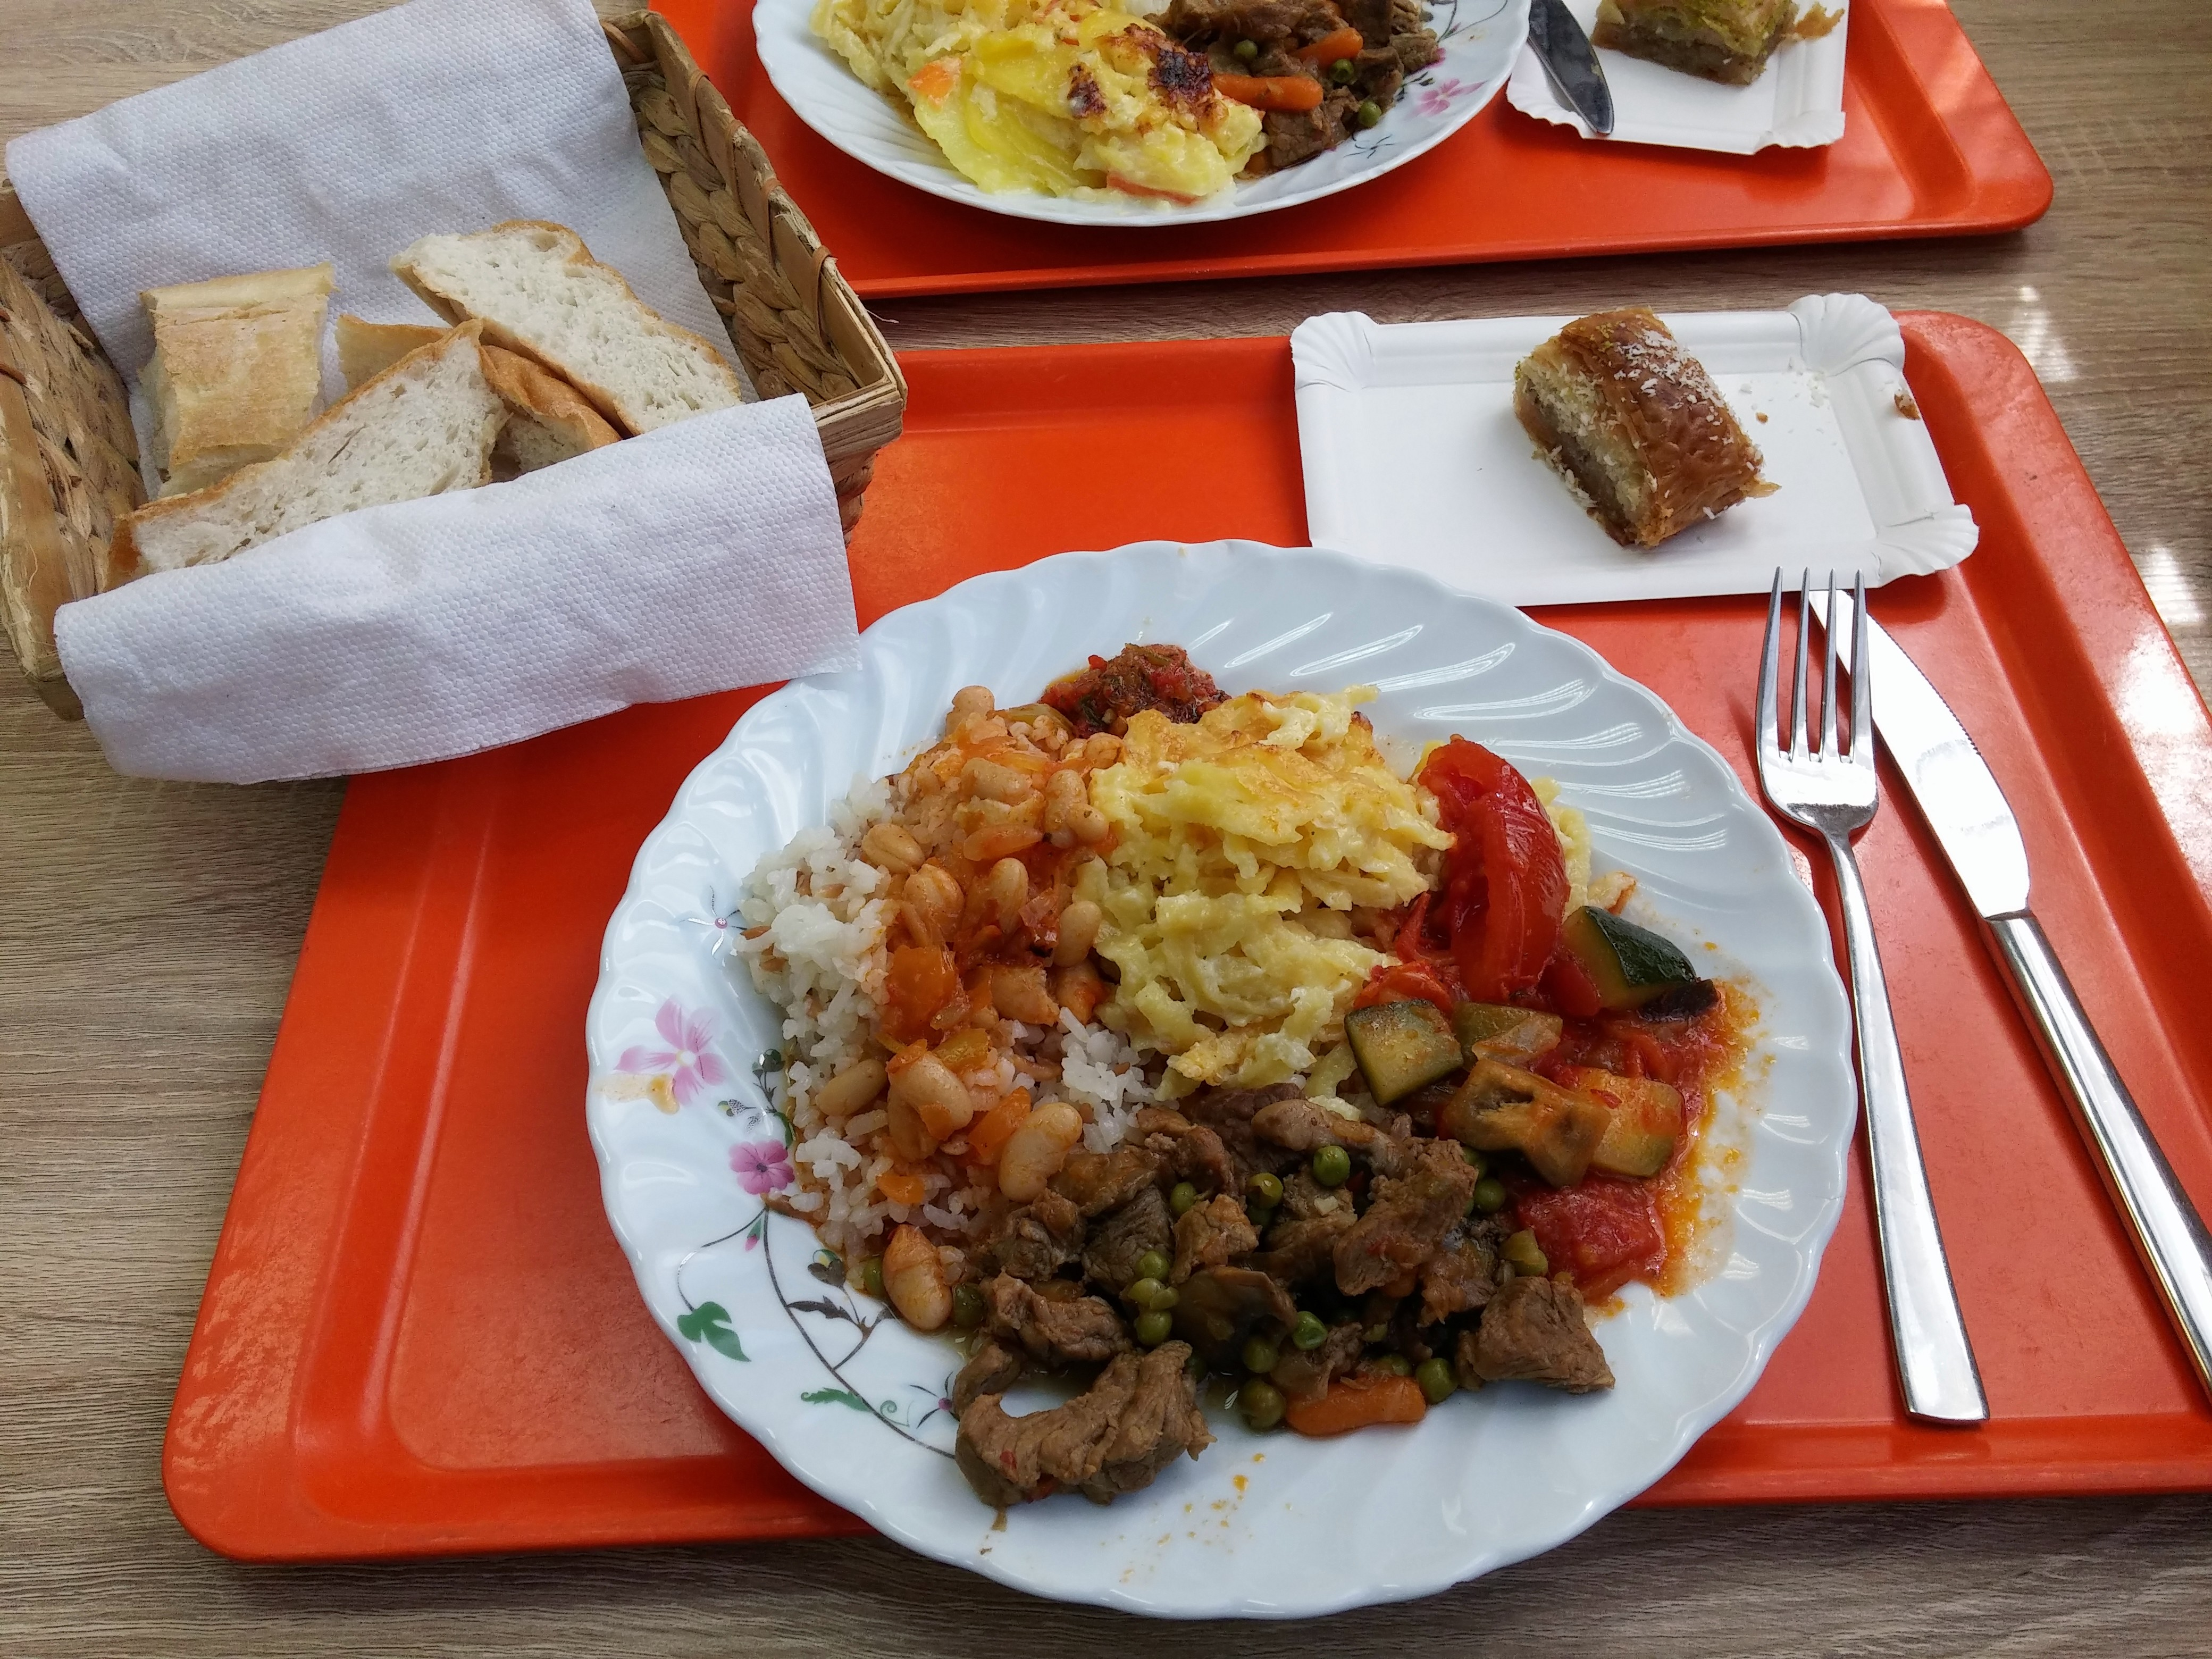 https://foodloader.net/nico_2015-04-20_reis-rindfleisch-kaesespaetzle-gemuese-brot-baklava.jpg